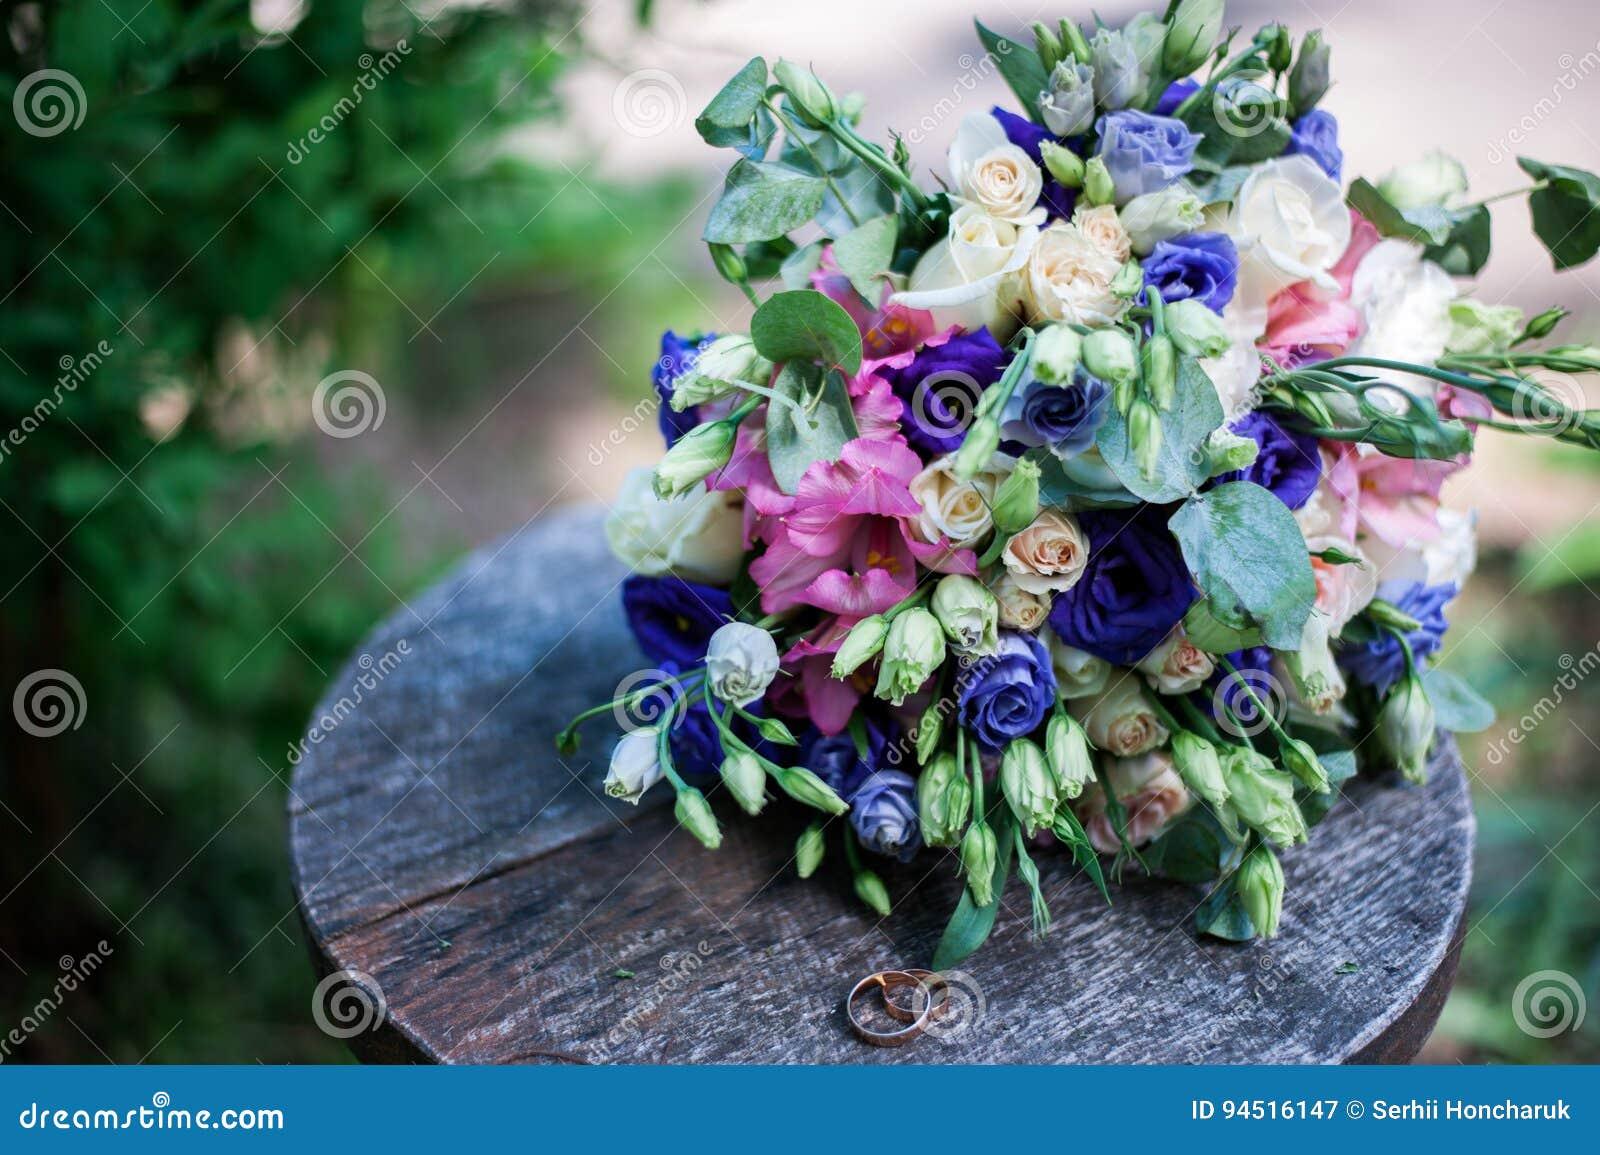 Wedding bouquet stock image image of love objects table 94516147 download wedding bouquet stock image image of love objects table 94516147 izmirmasajfo